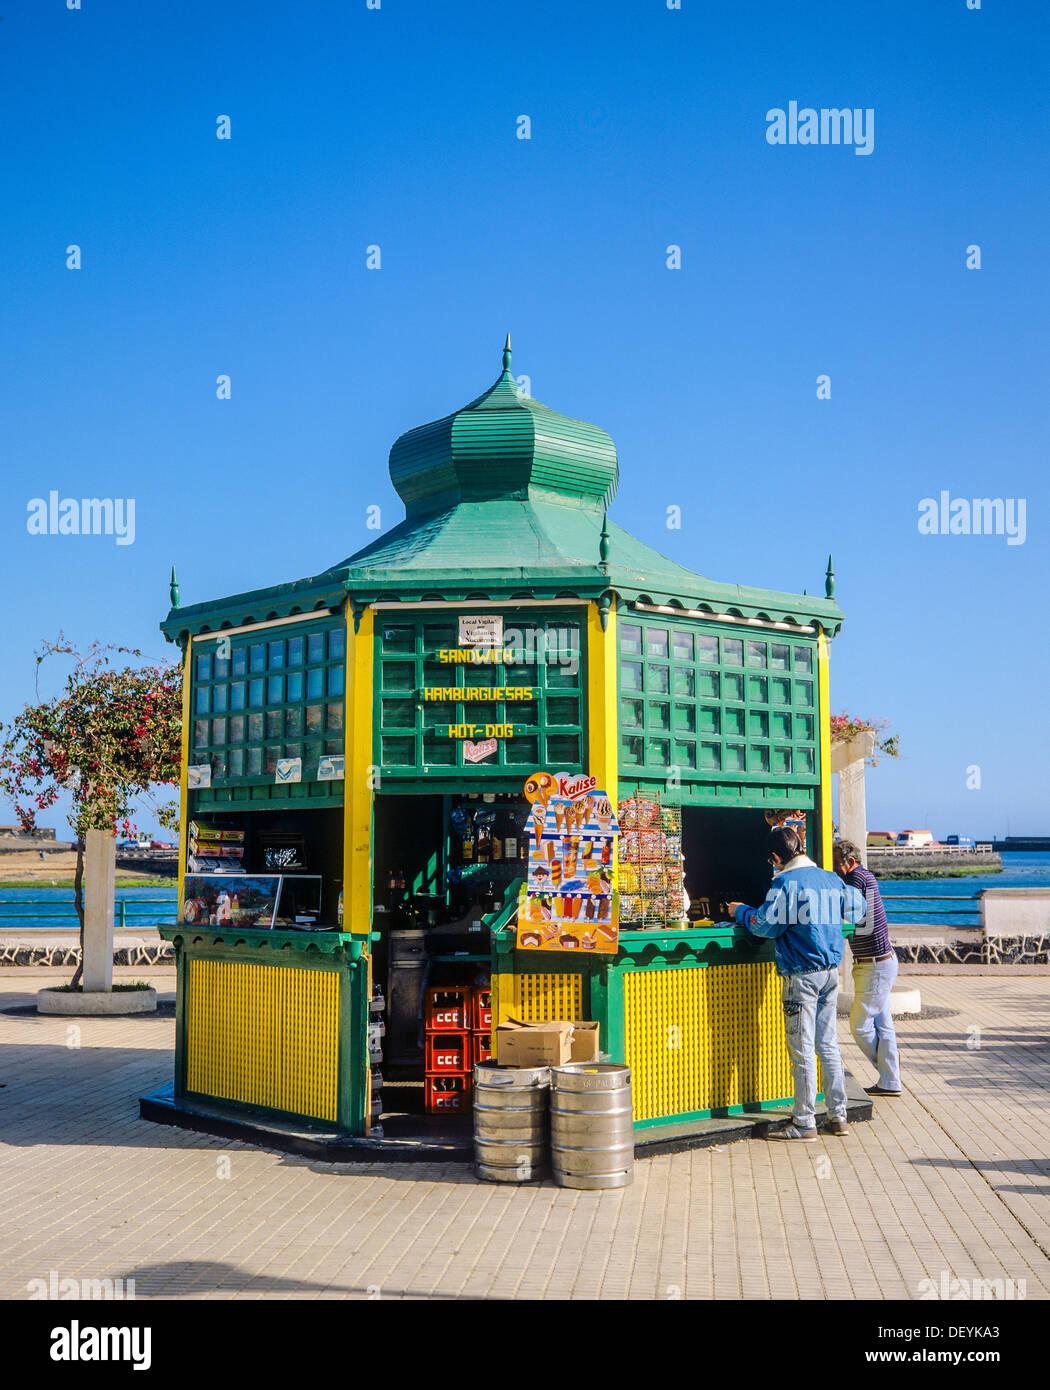 Coffee kiosk at sea promenade Arrecife Lanzarote Canary Islands Spain Stock Photo